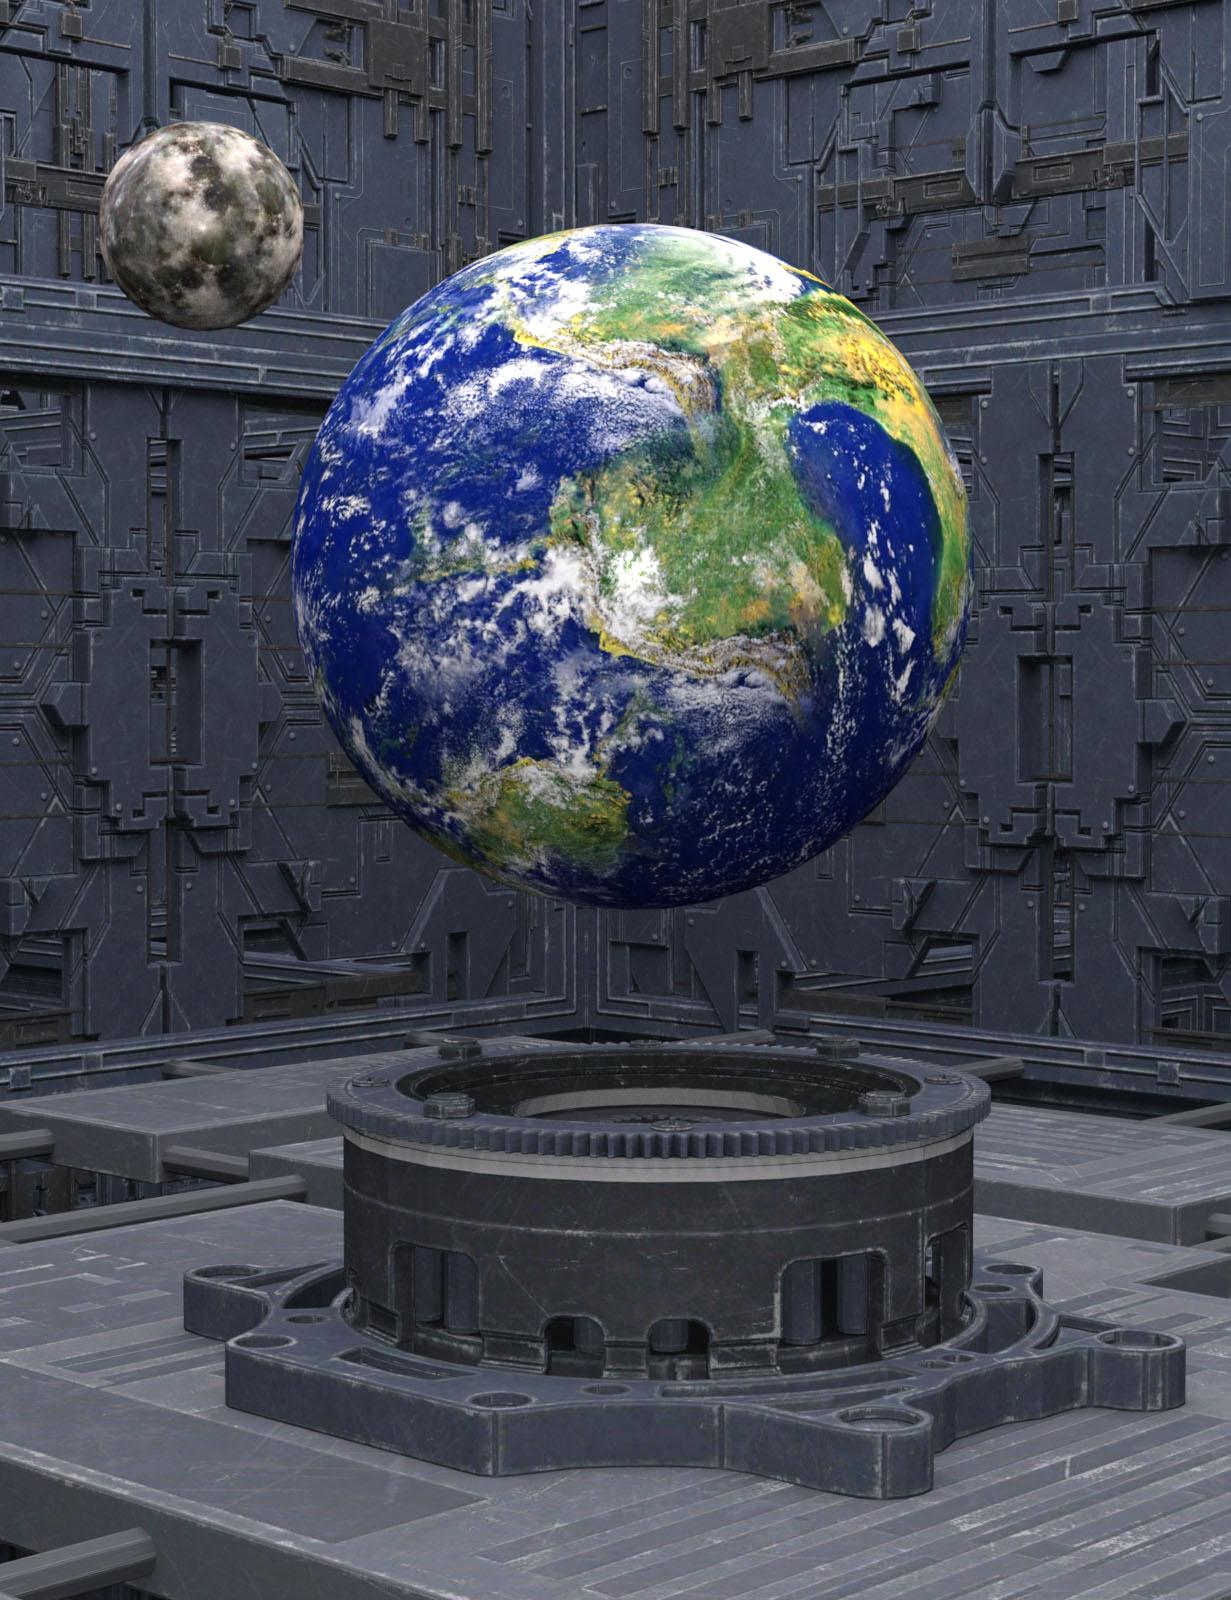 Machinarium by: Oskarsson, 3D Models by Daz 3D